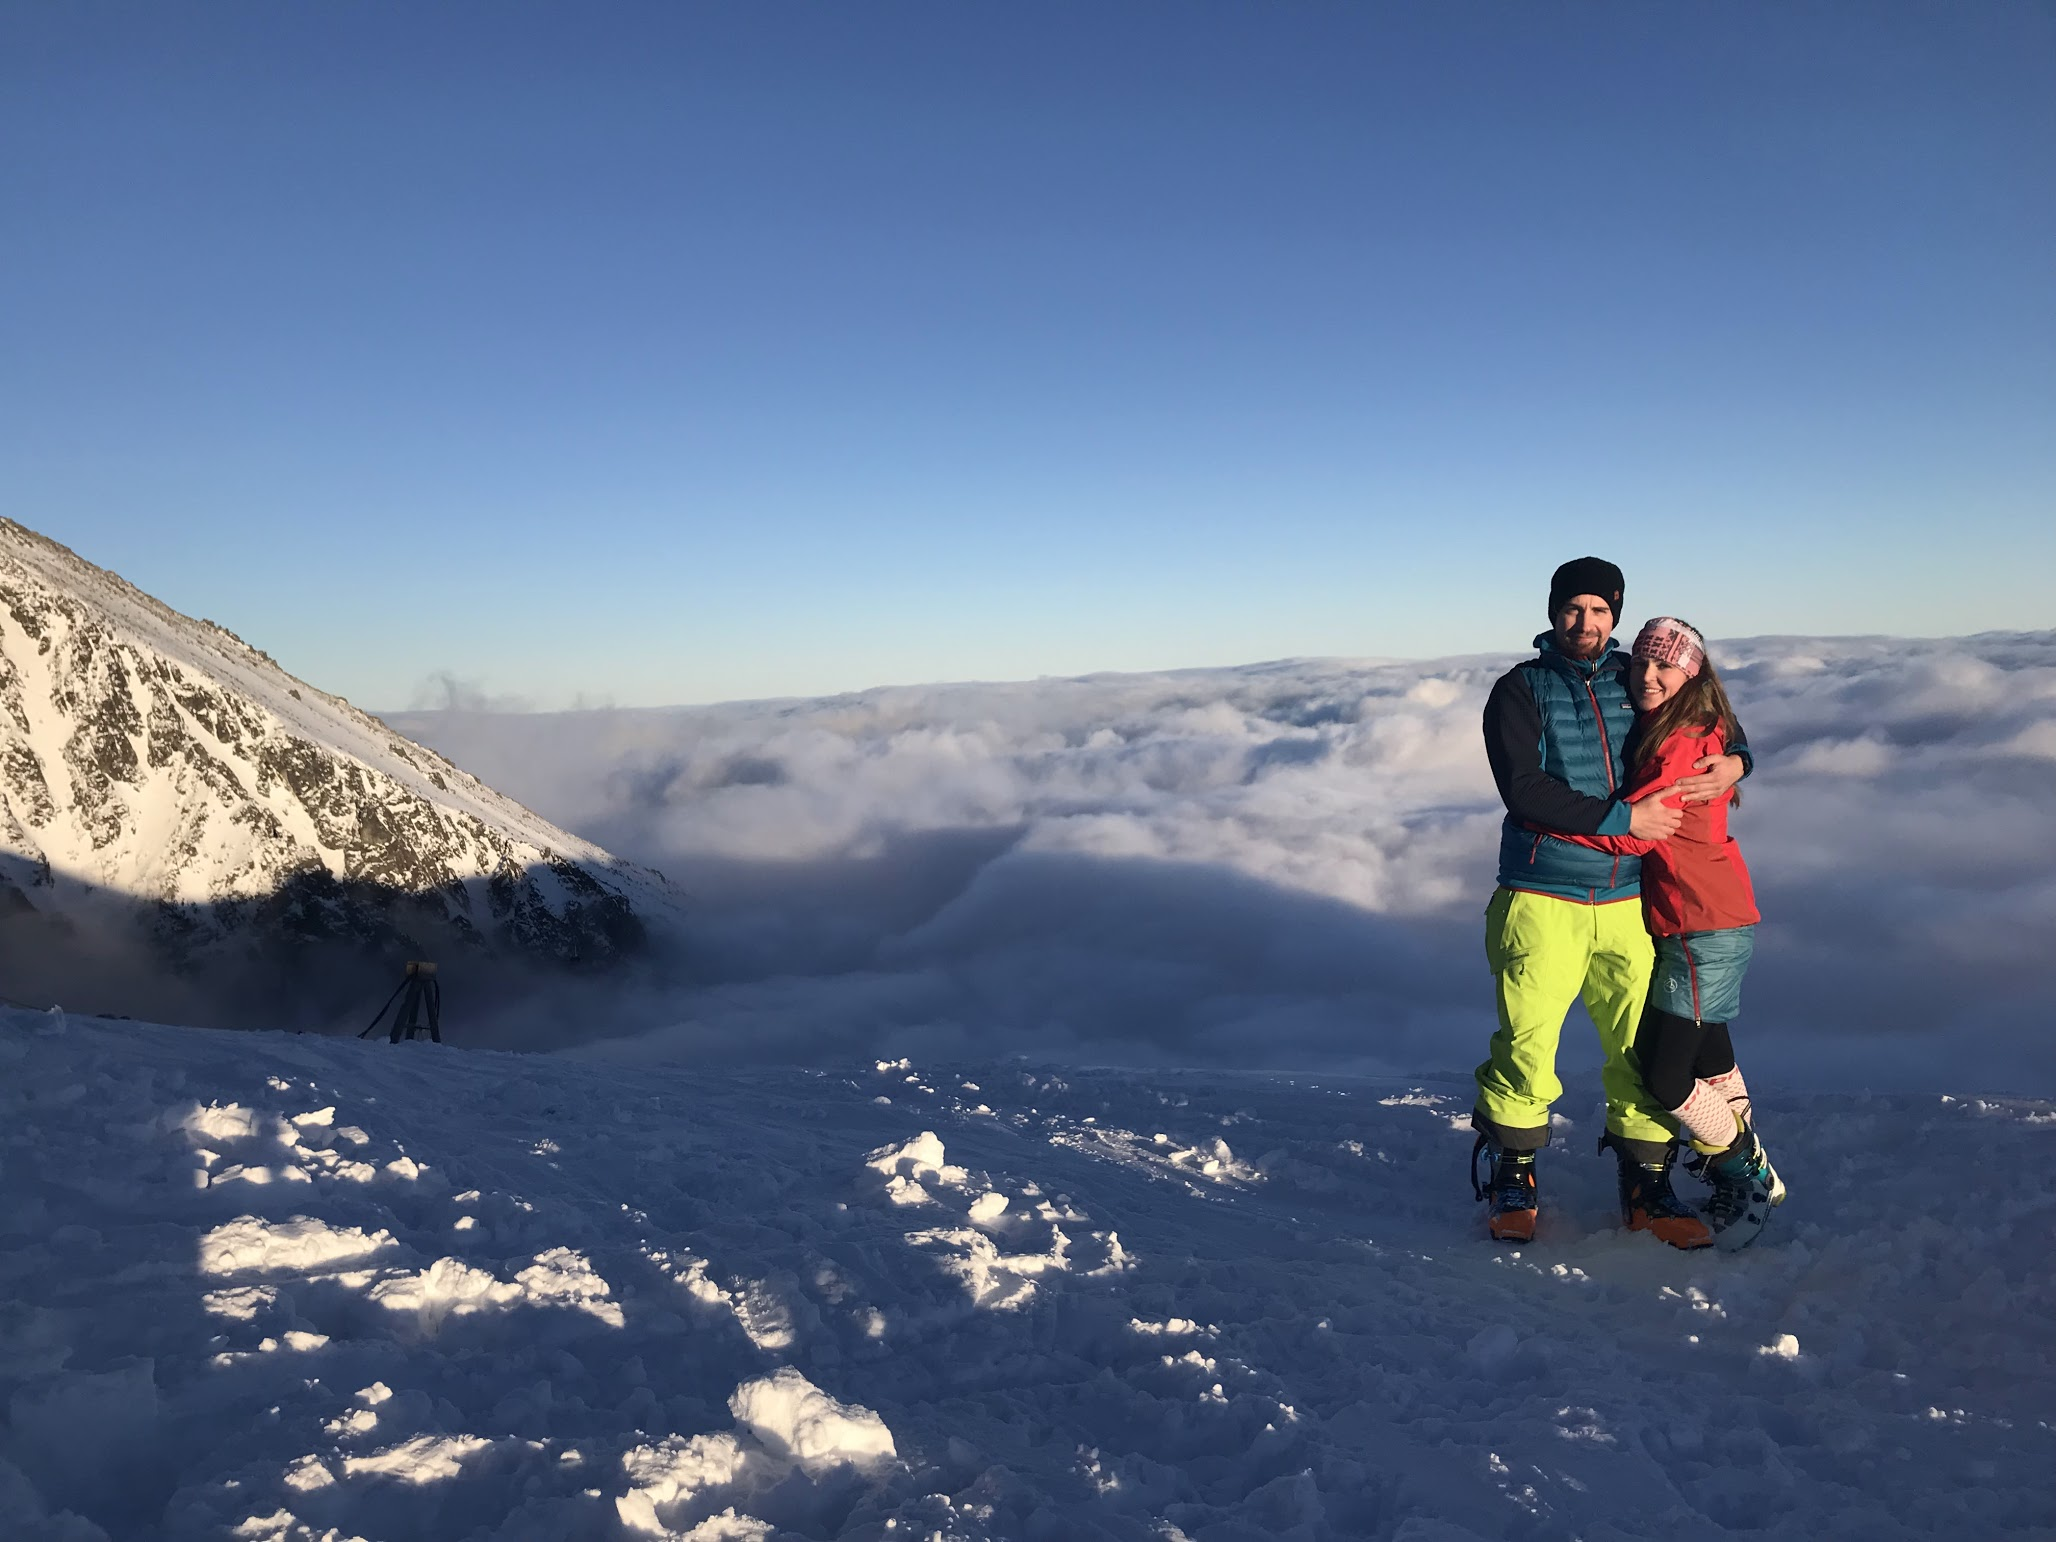 Lomnicke sedlo skitour (Slovakia) - Dec 18